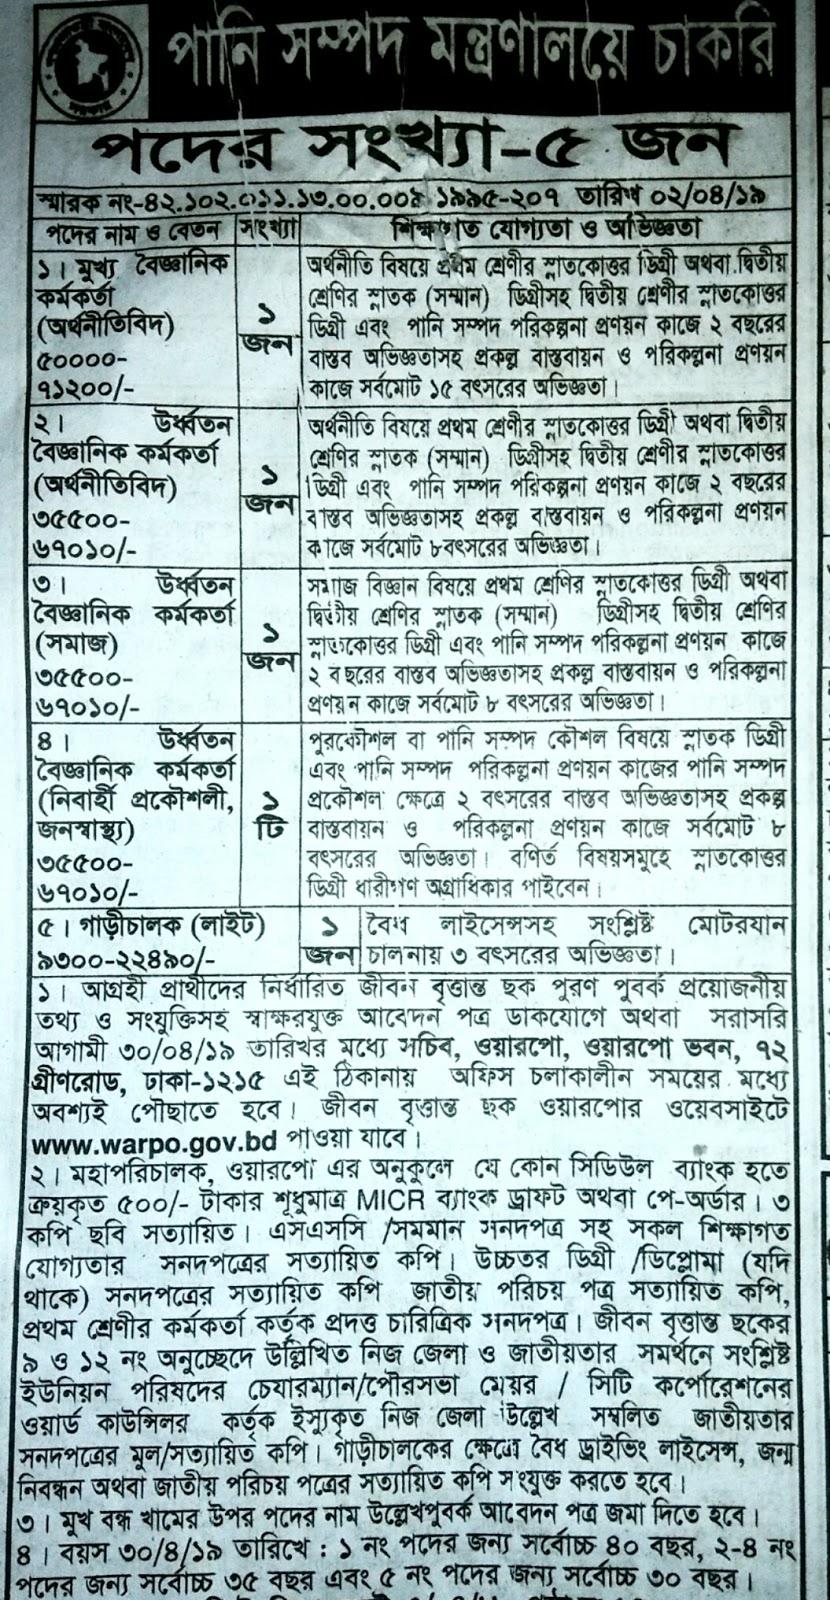 Ministry of water Resources job circular. পানি সম্পদ মন্ত্রণালয় নিয়োগ বিজ্ঞপ্তি